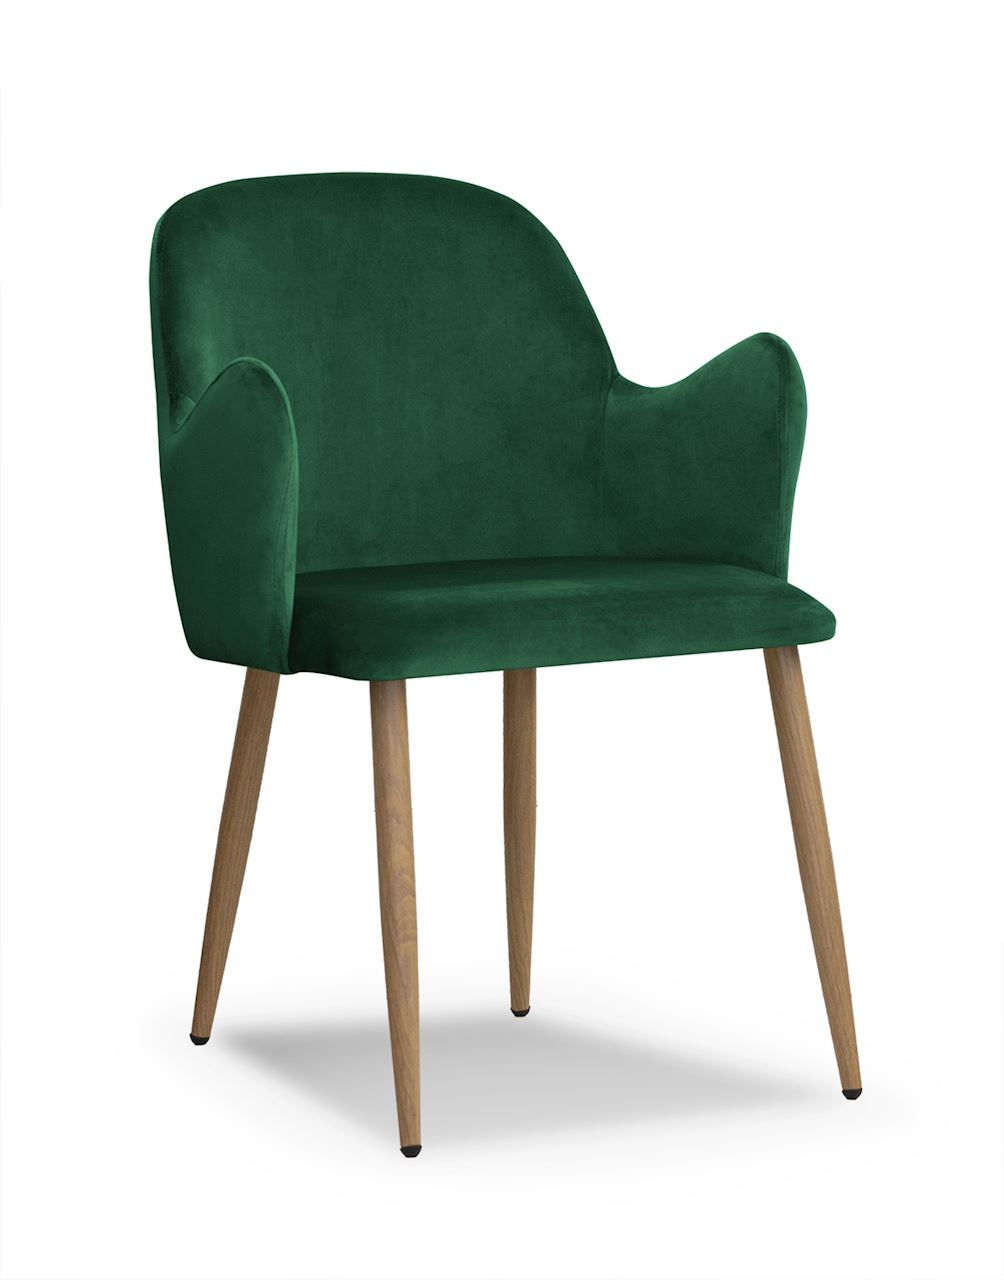 Scaun tapitat cu stofa, cu picioare metalice Camel Green / Oak, l58xA63xH84 cm